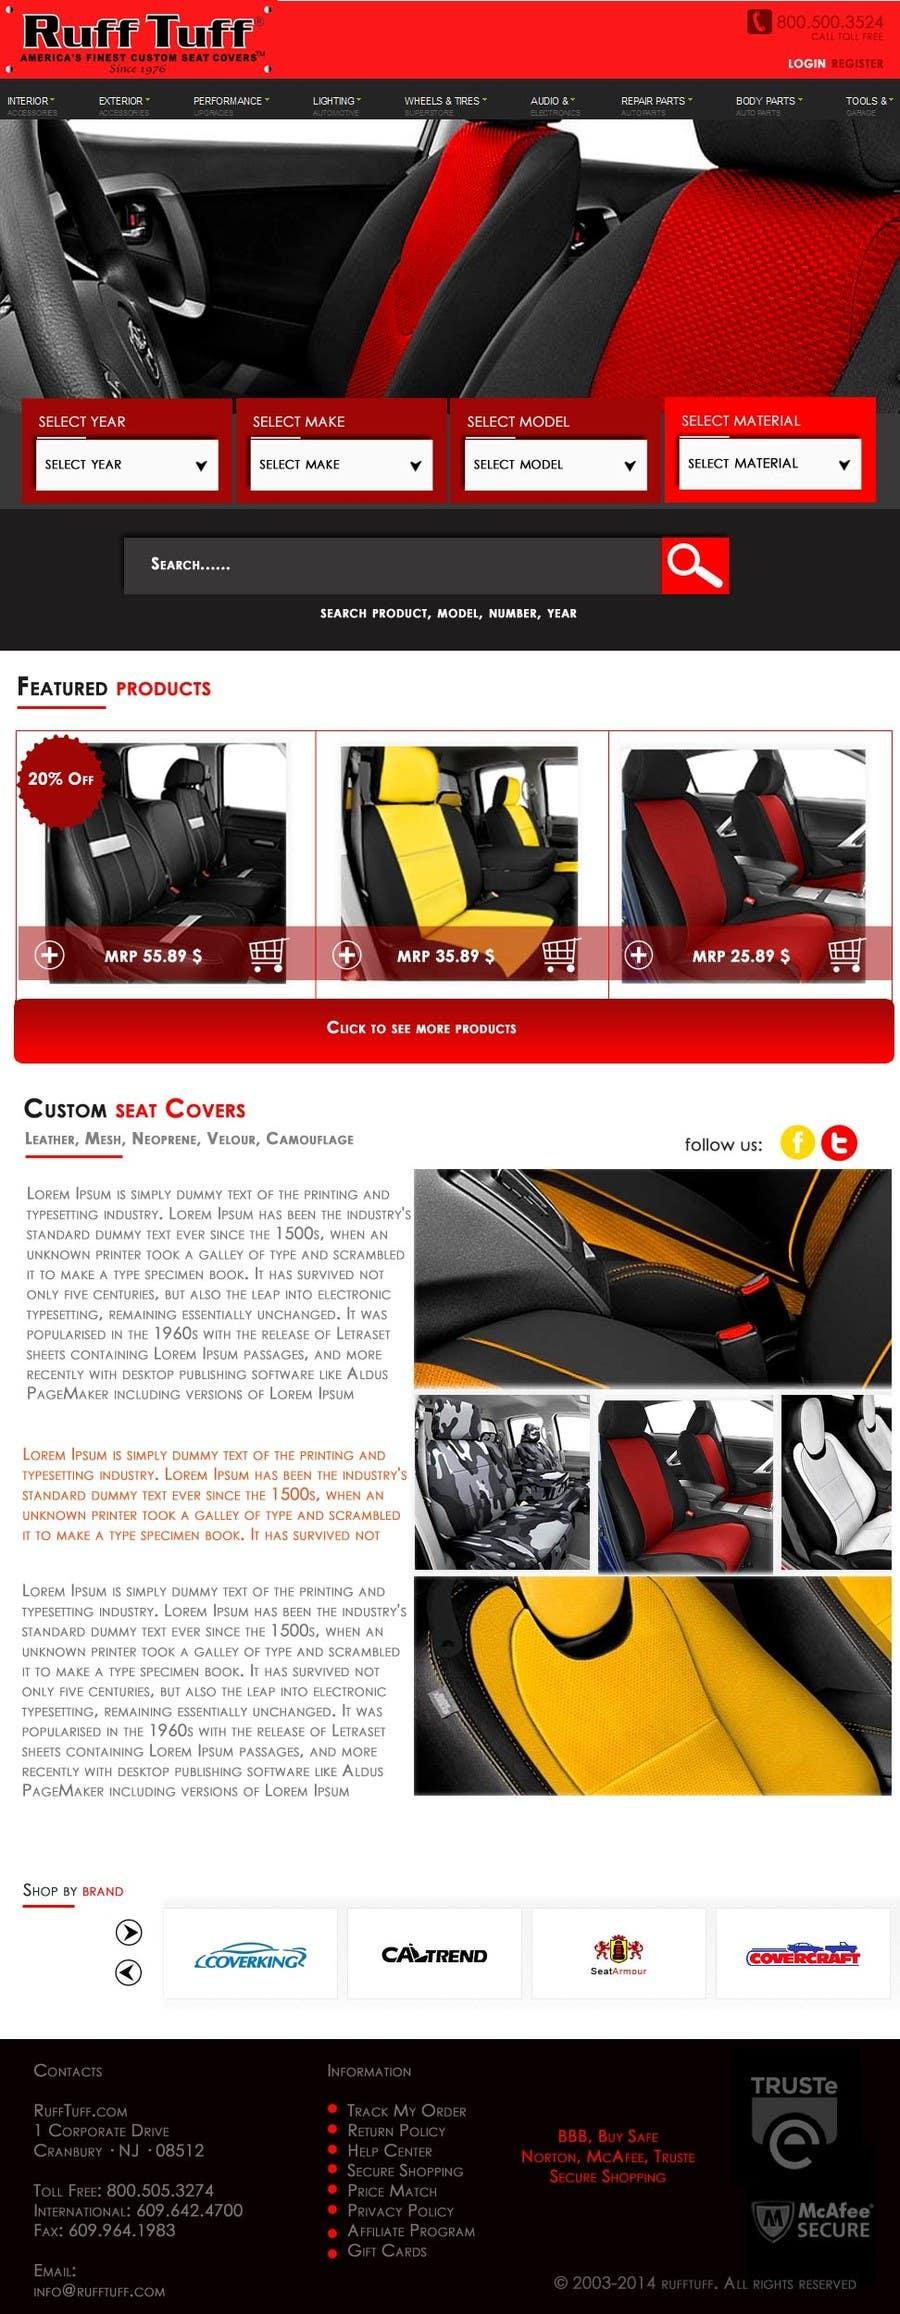 Penyertaan Peraduan #                                        12                                      untuk                                         Design a Website Mockup for an auto seat cover manufacturer